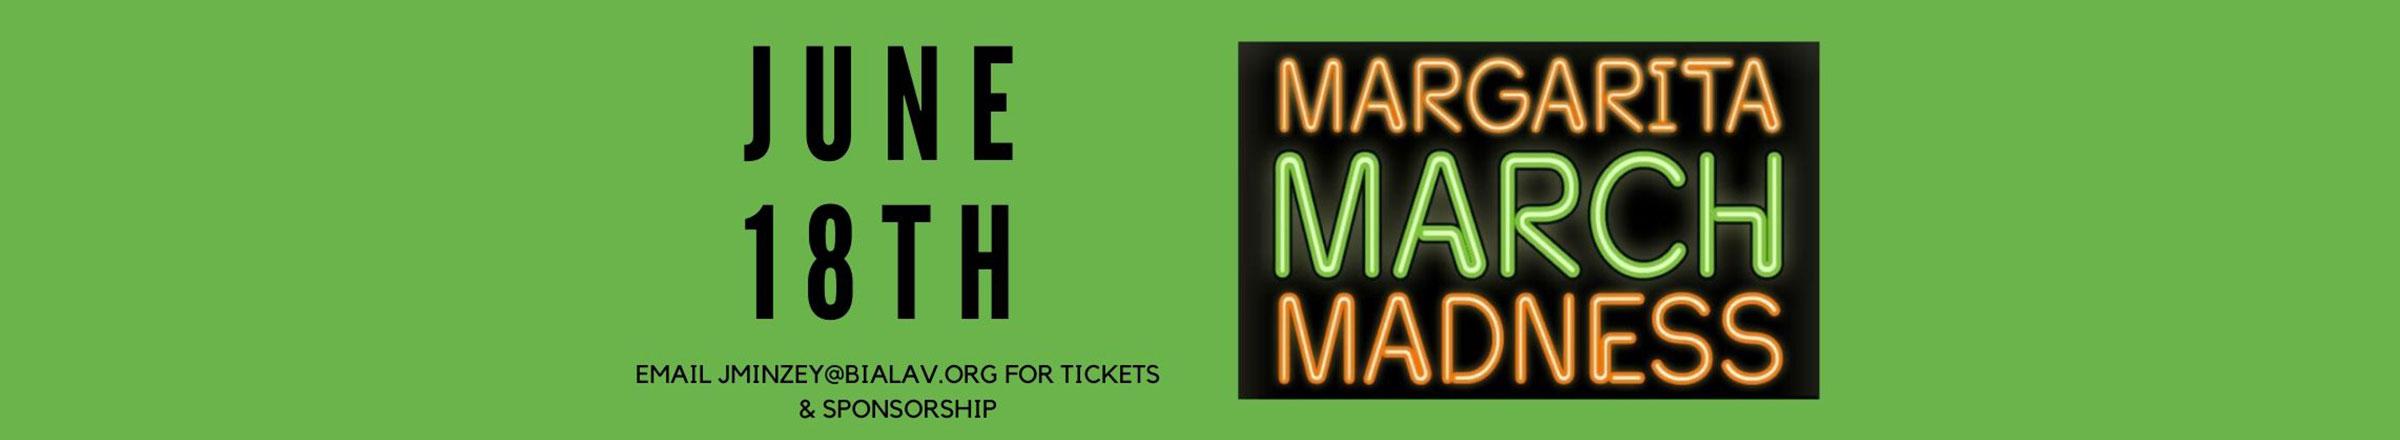 2020-03-20-BIALAV-Margarita-Madness